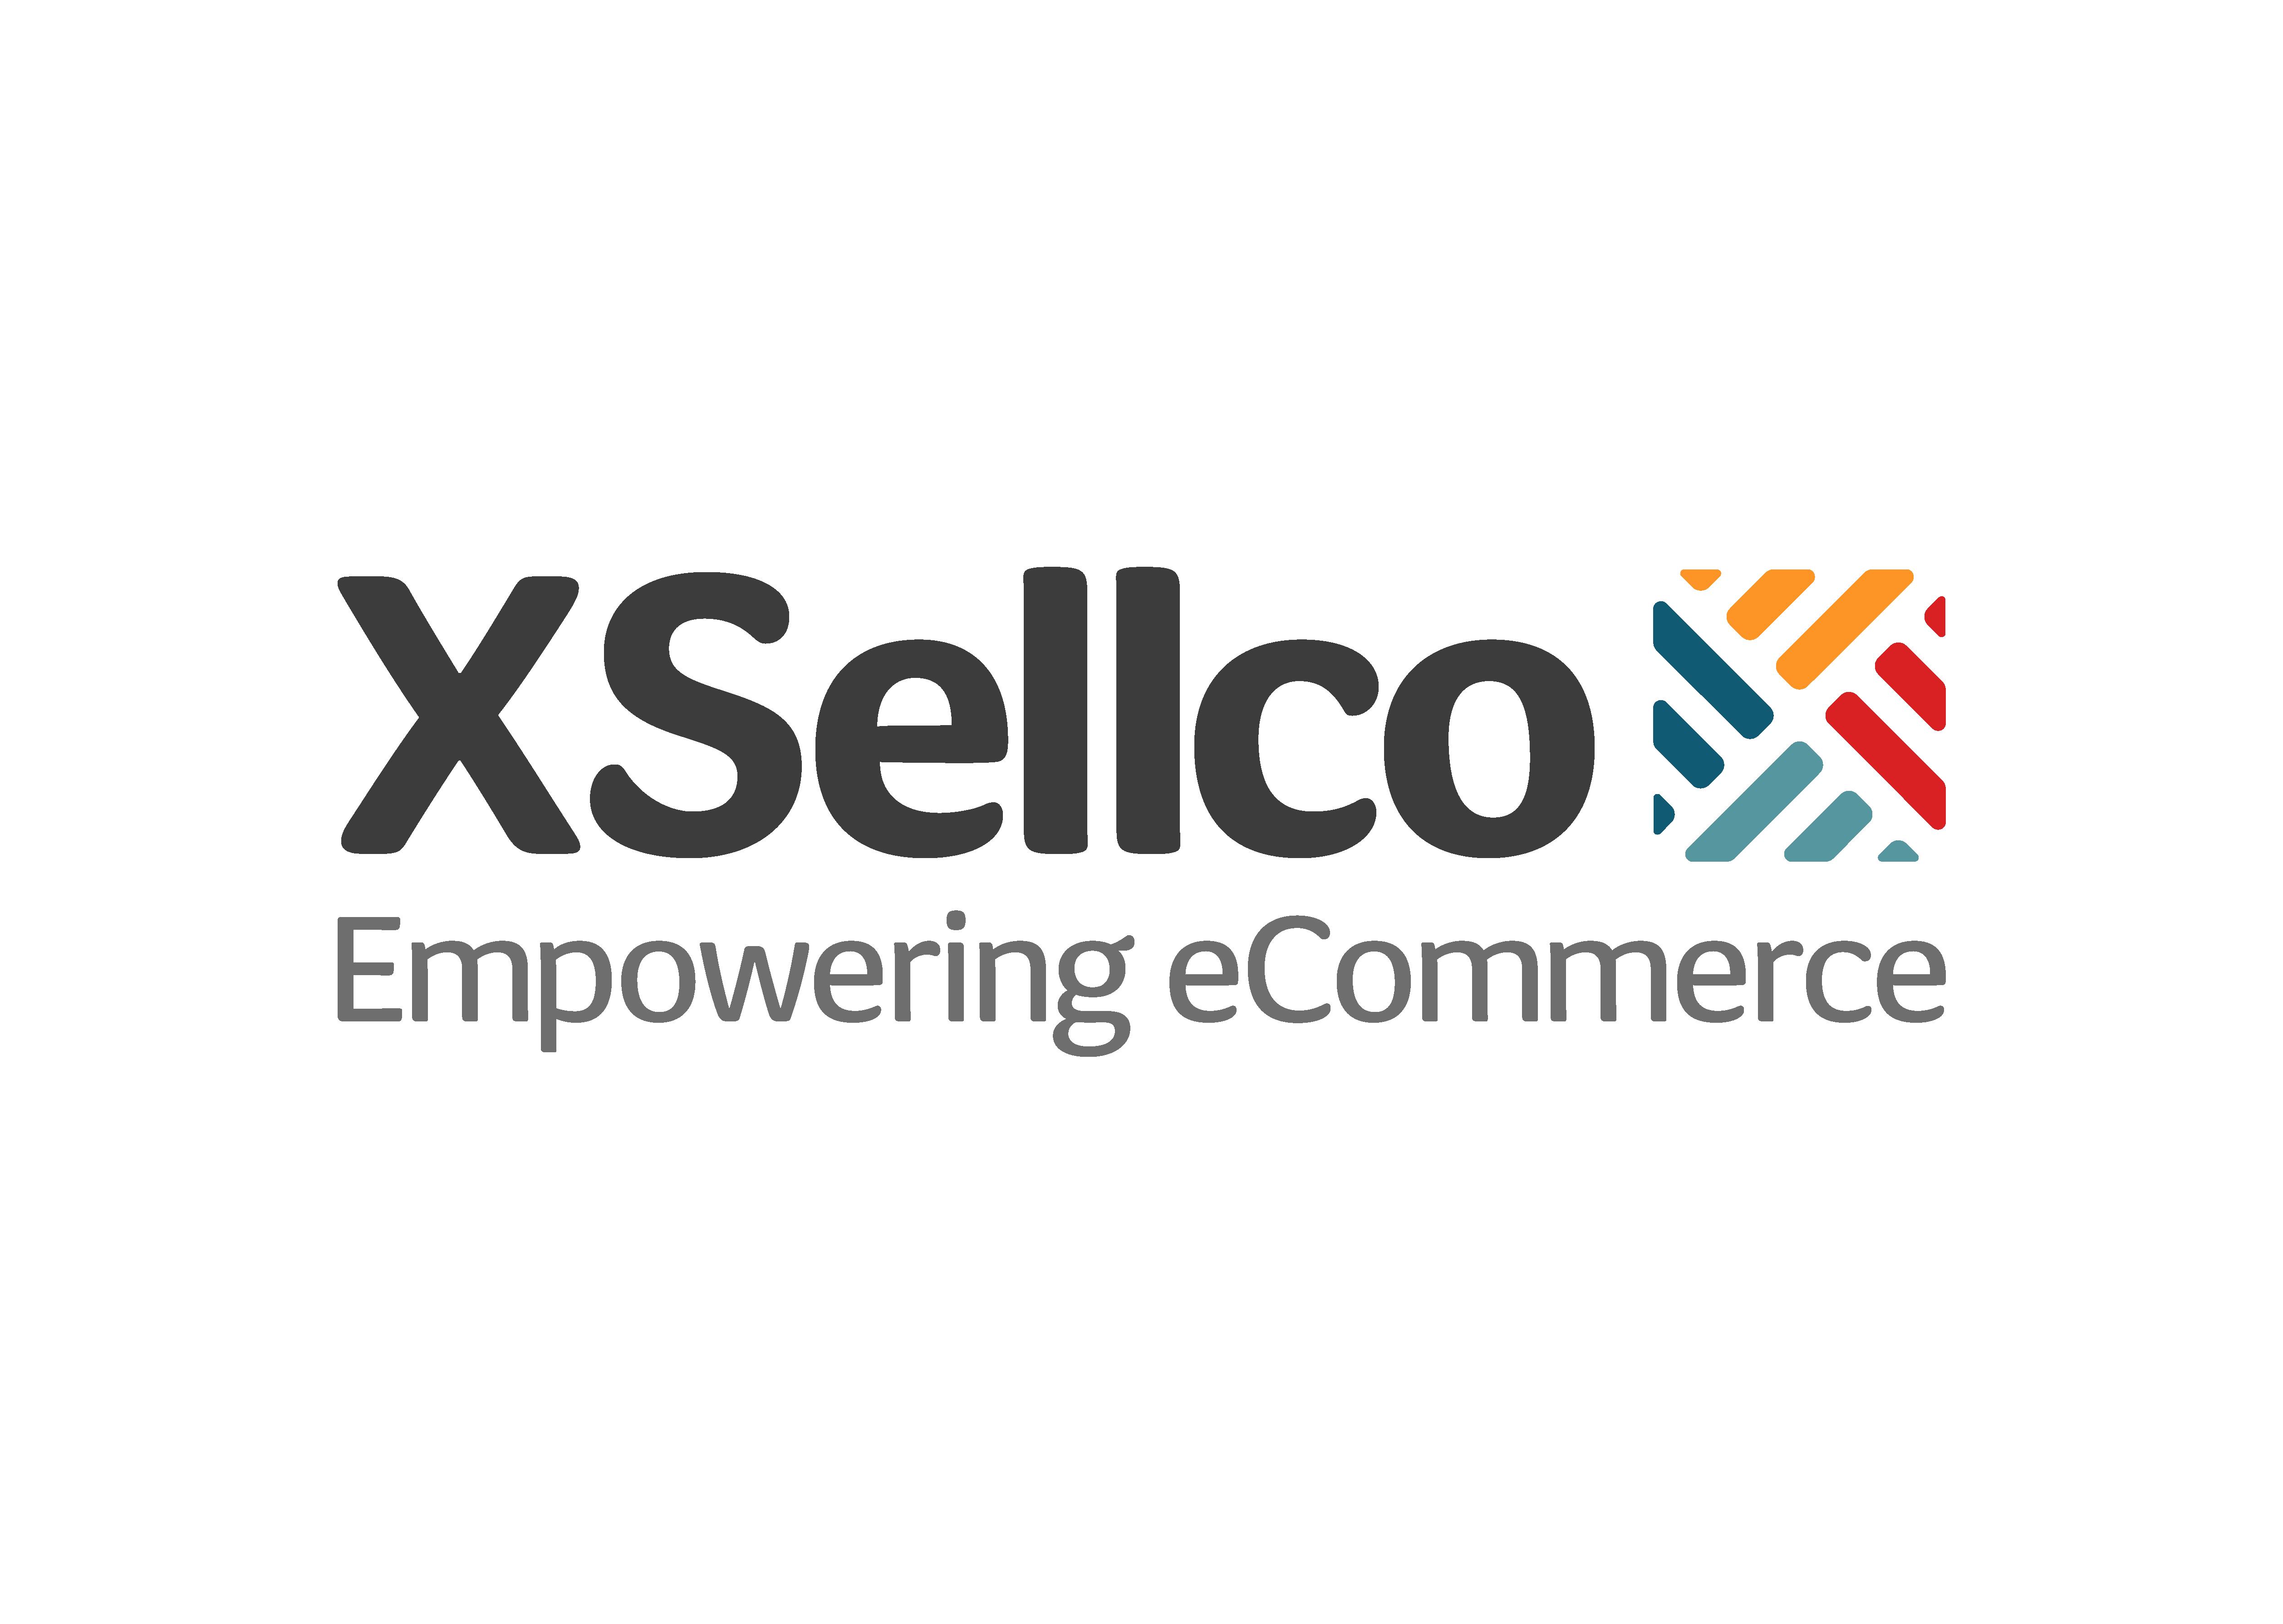 Xsellco Brightpearl Partner Listing